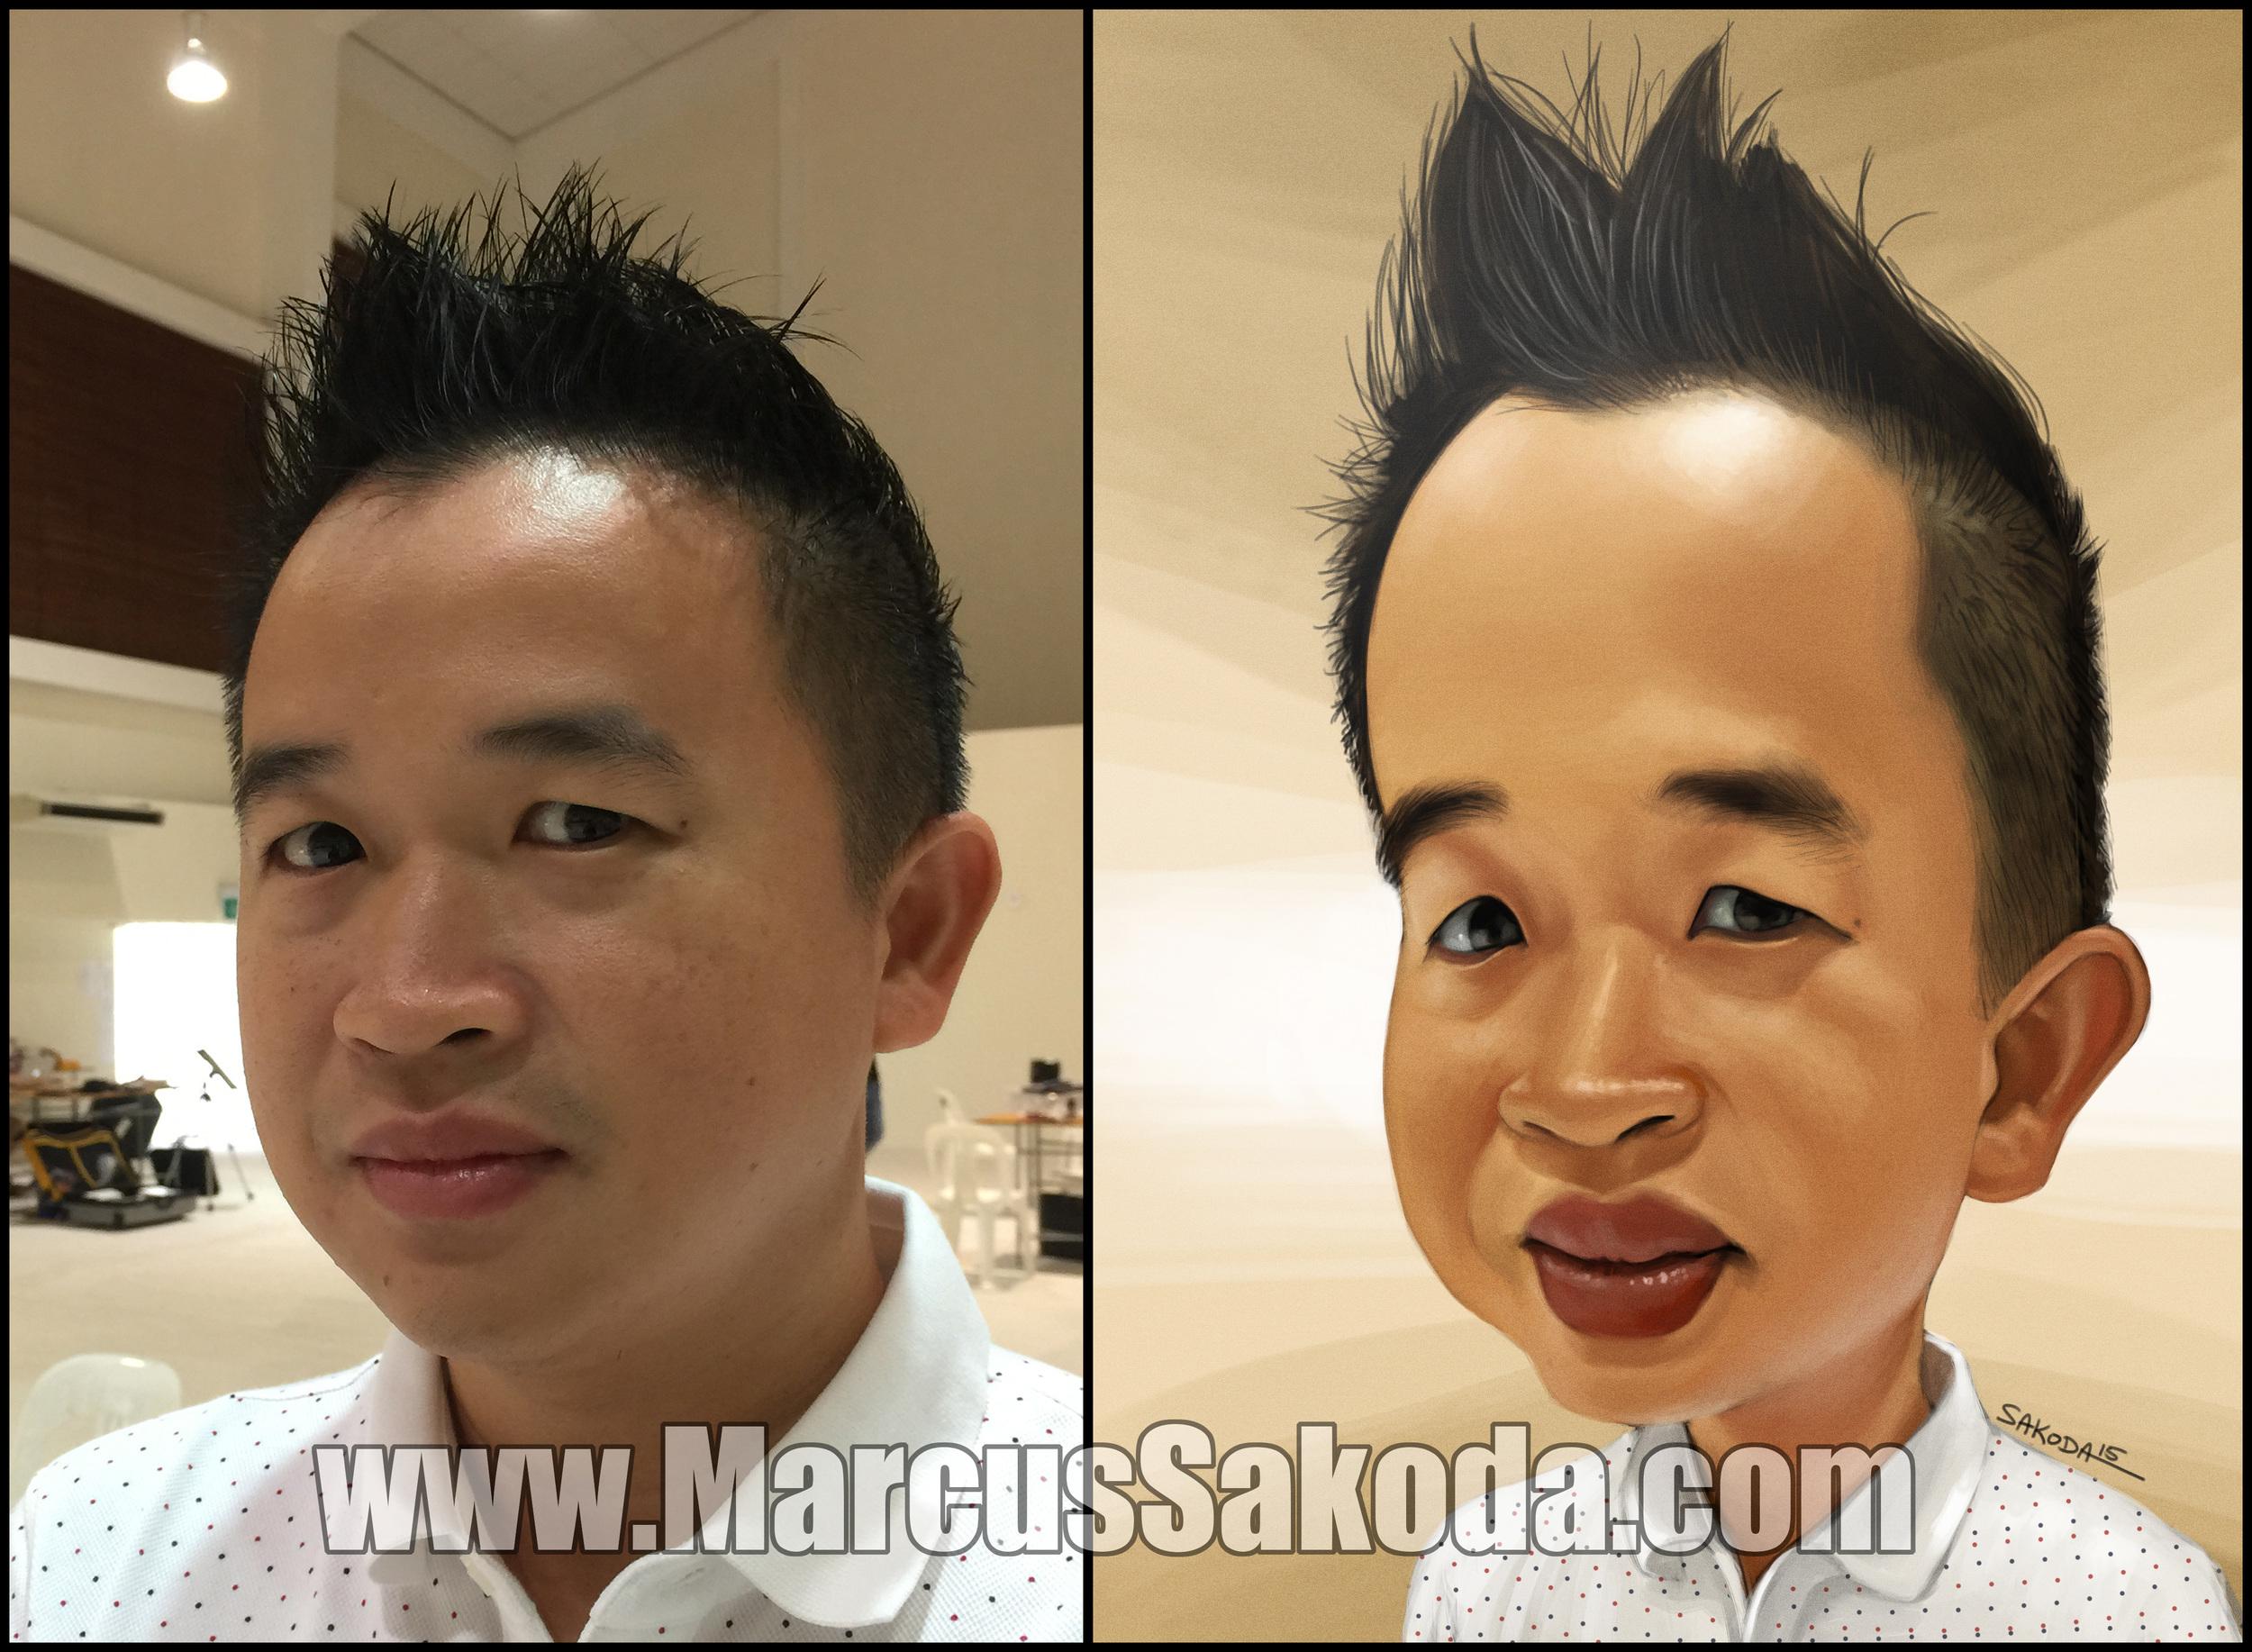 Choong Jit Leong from Singapore